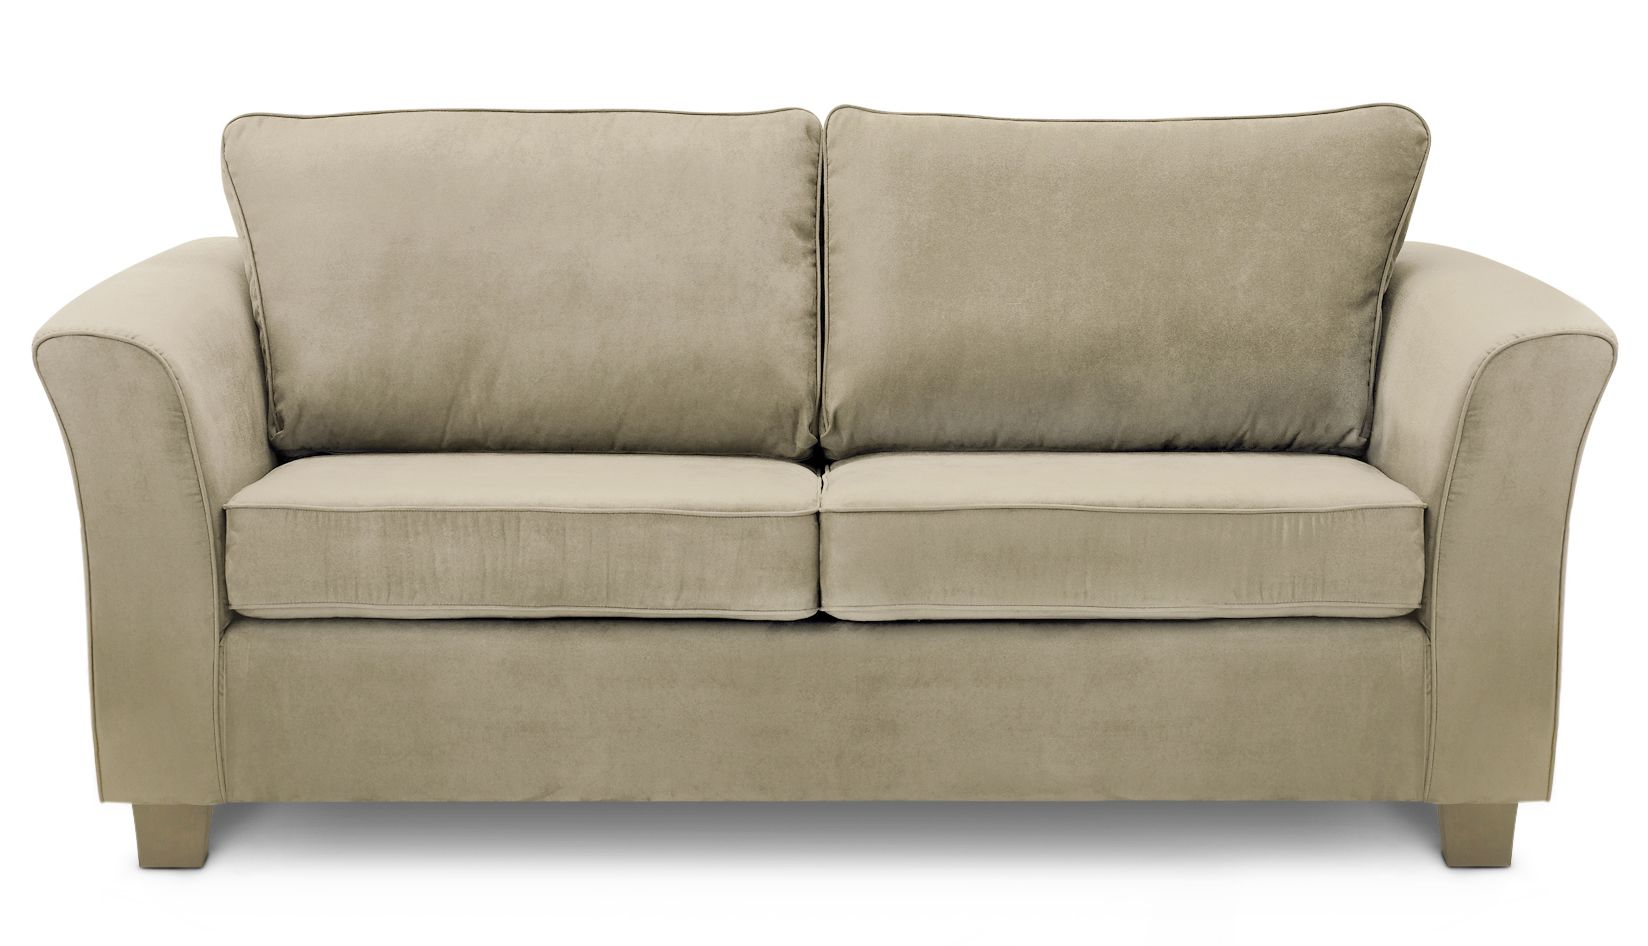 Best Ikea Couches And Loveseats Ikea Karlsvik Klamby Sofa 400 x 300